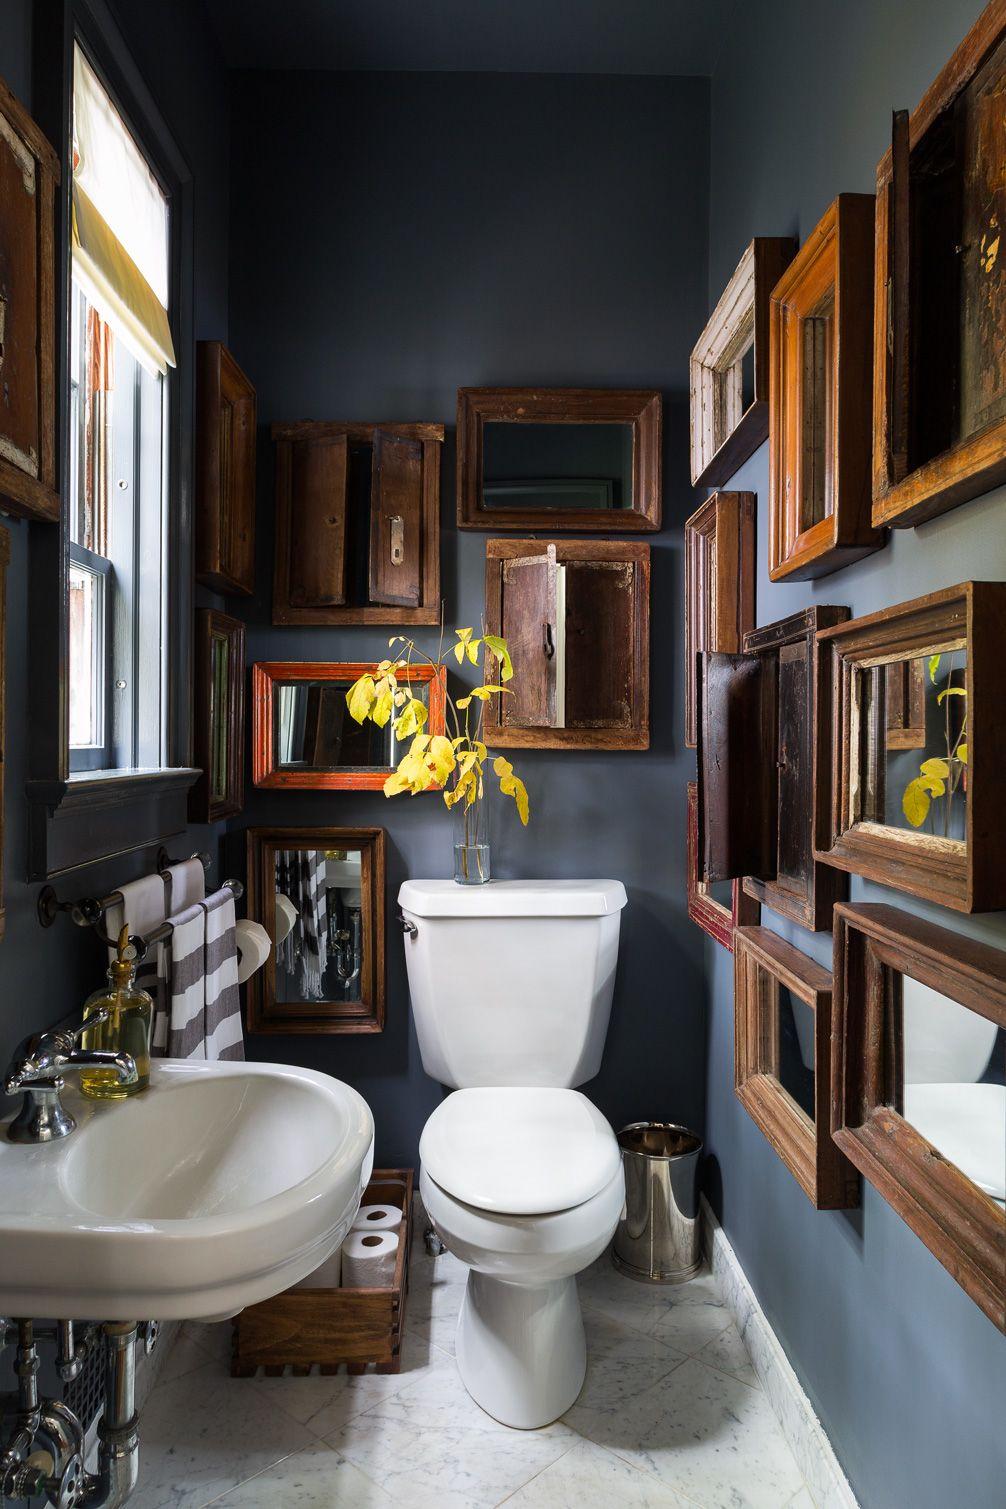 6 Tips To Make Your Bathroom Renovation Look Amazing Eclectic